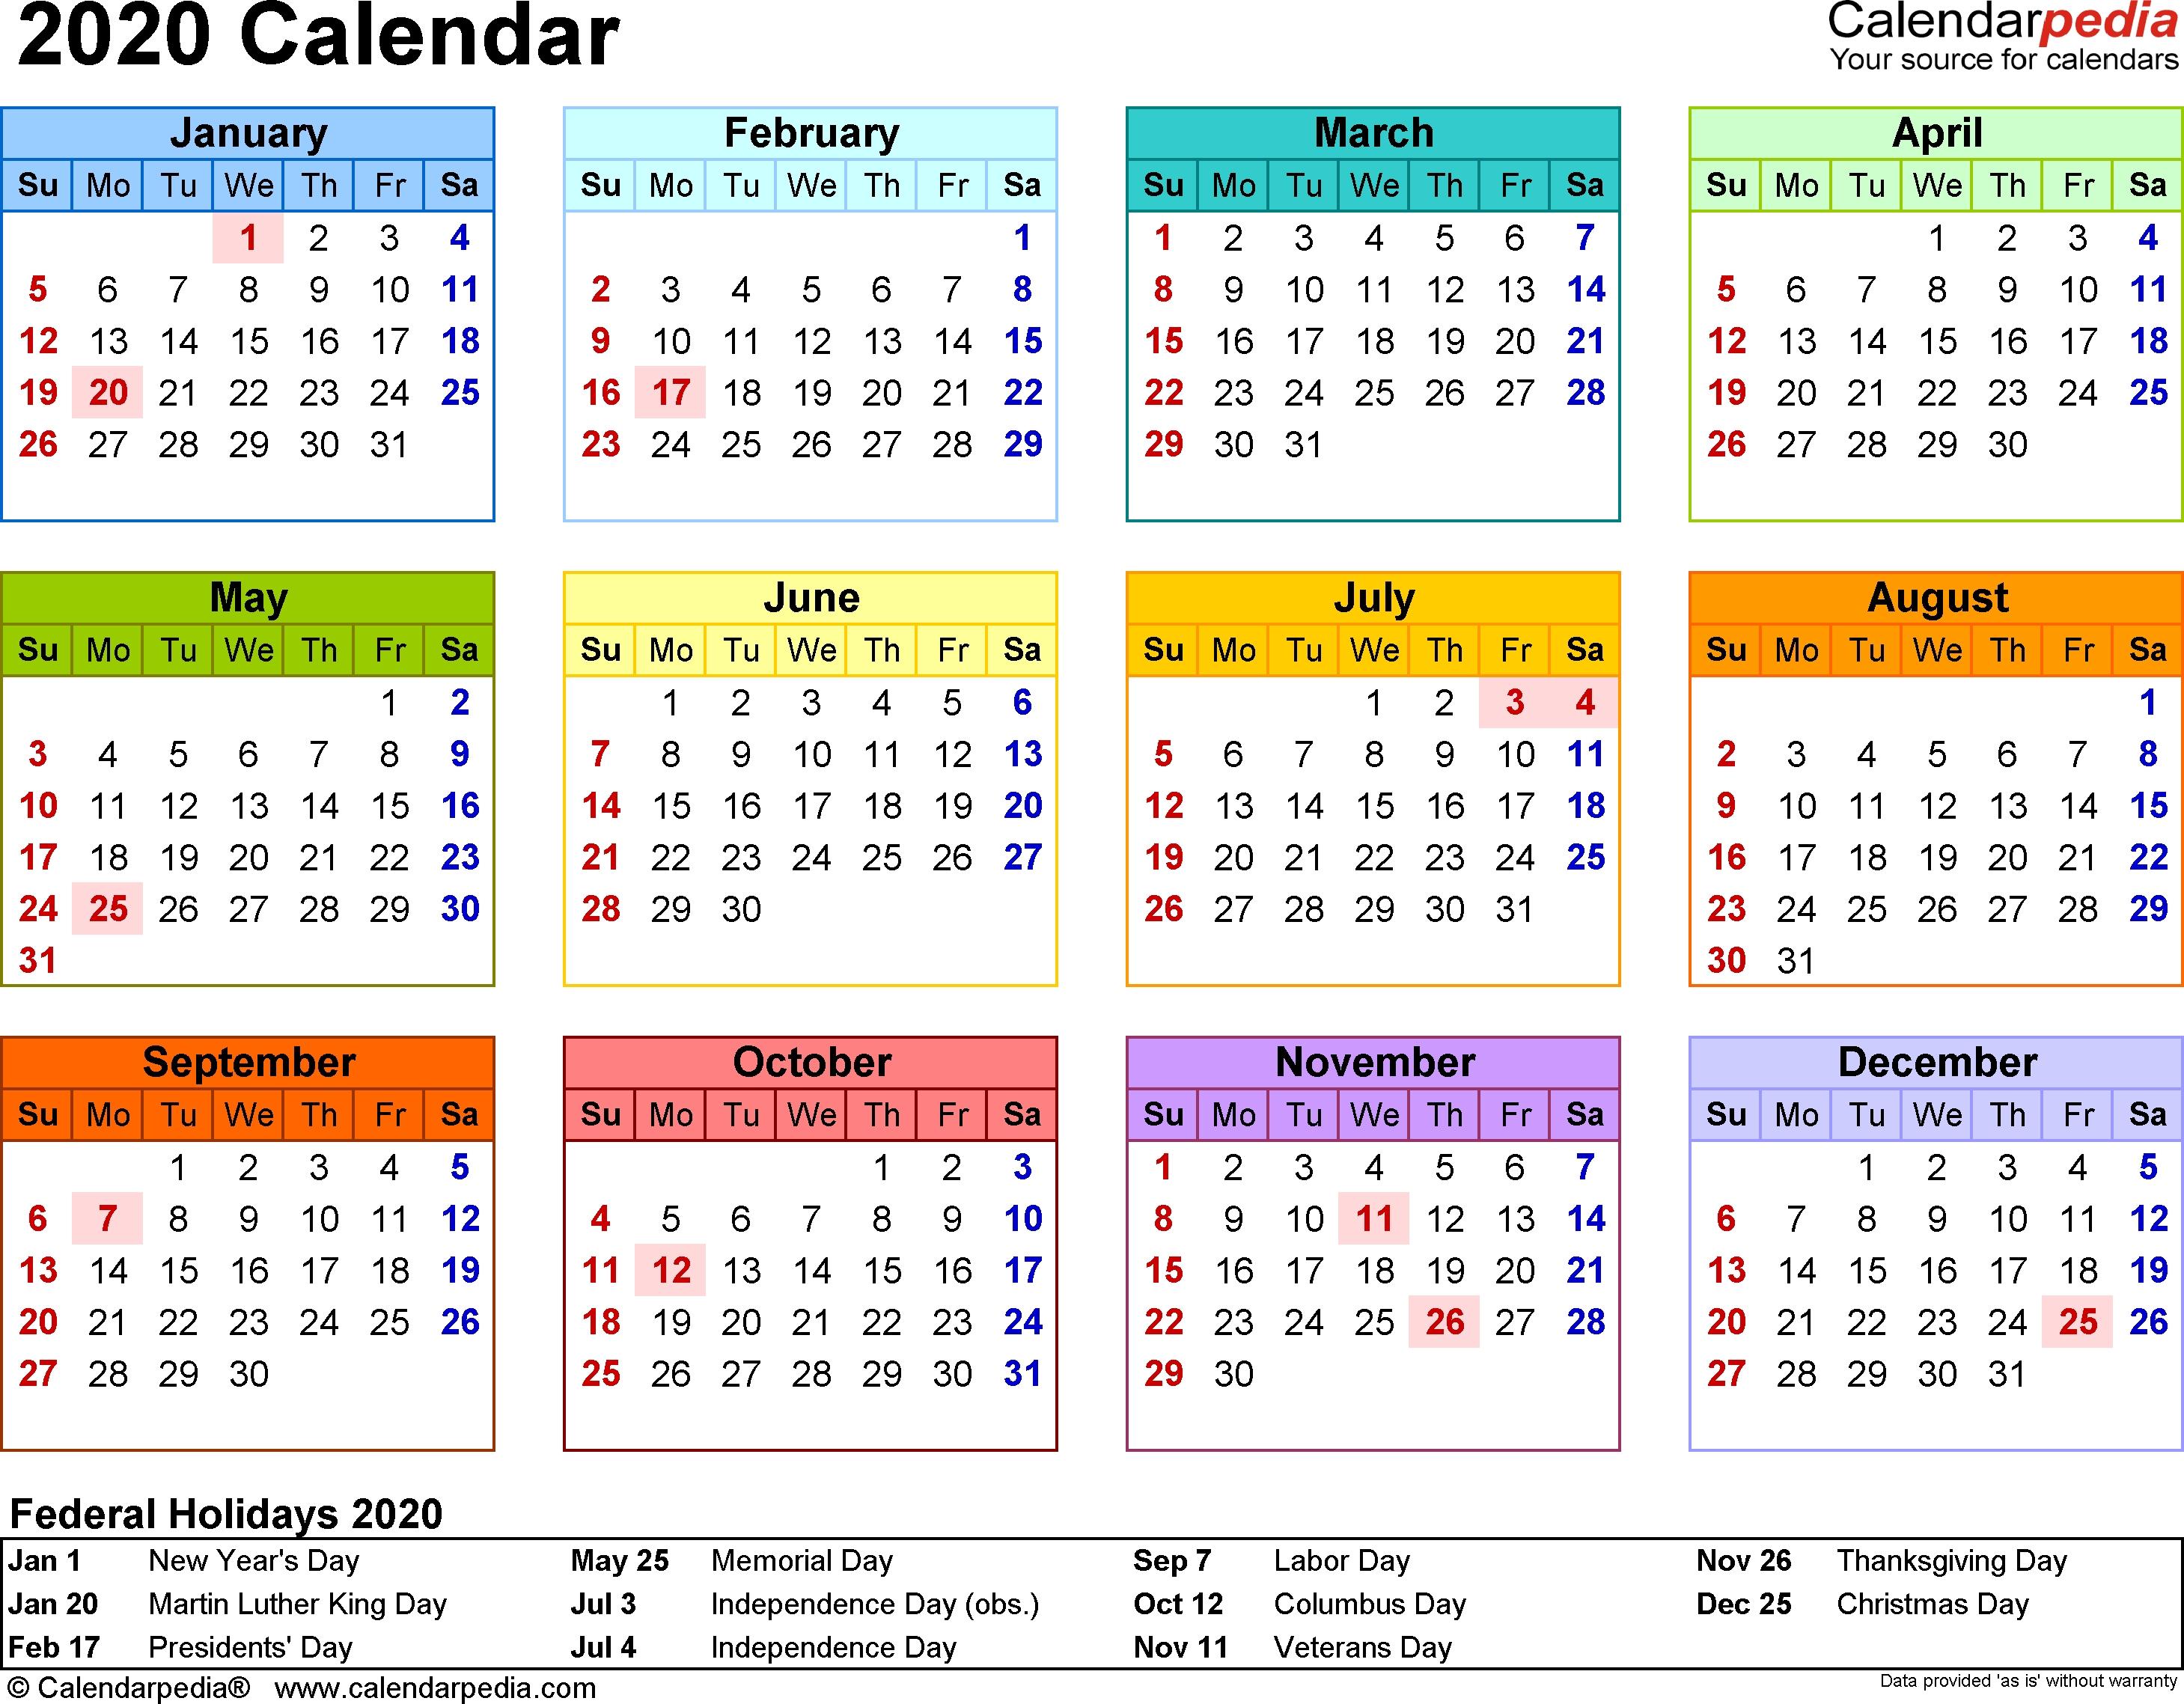 2020 Calendar - Download 17 Free Printable Excel Templates (.xlsx) in Outlook Calendar 2020